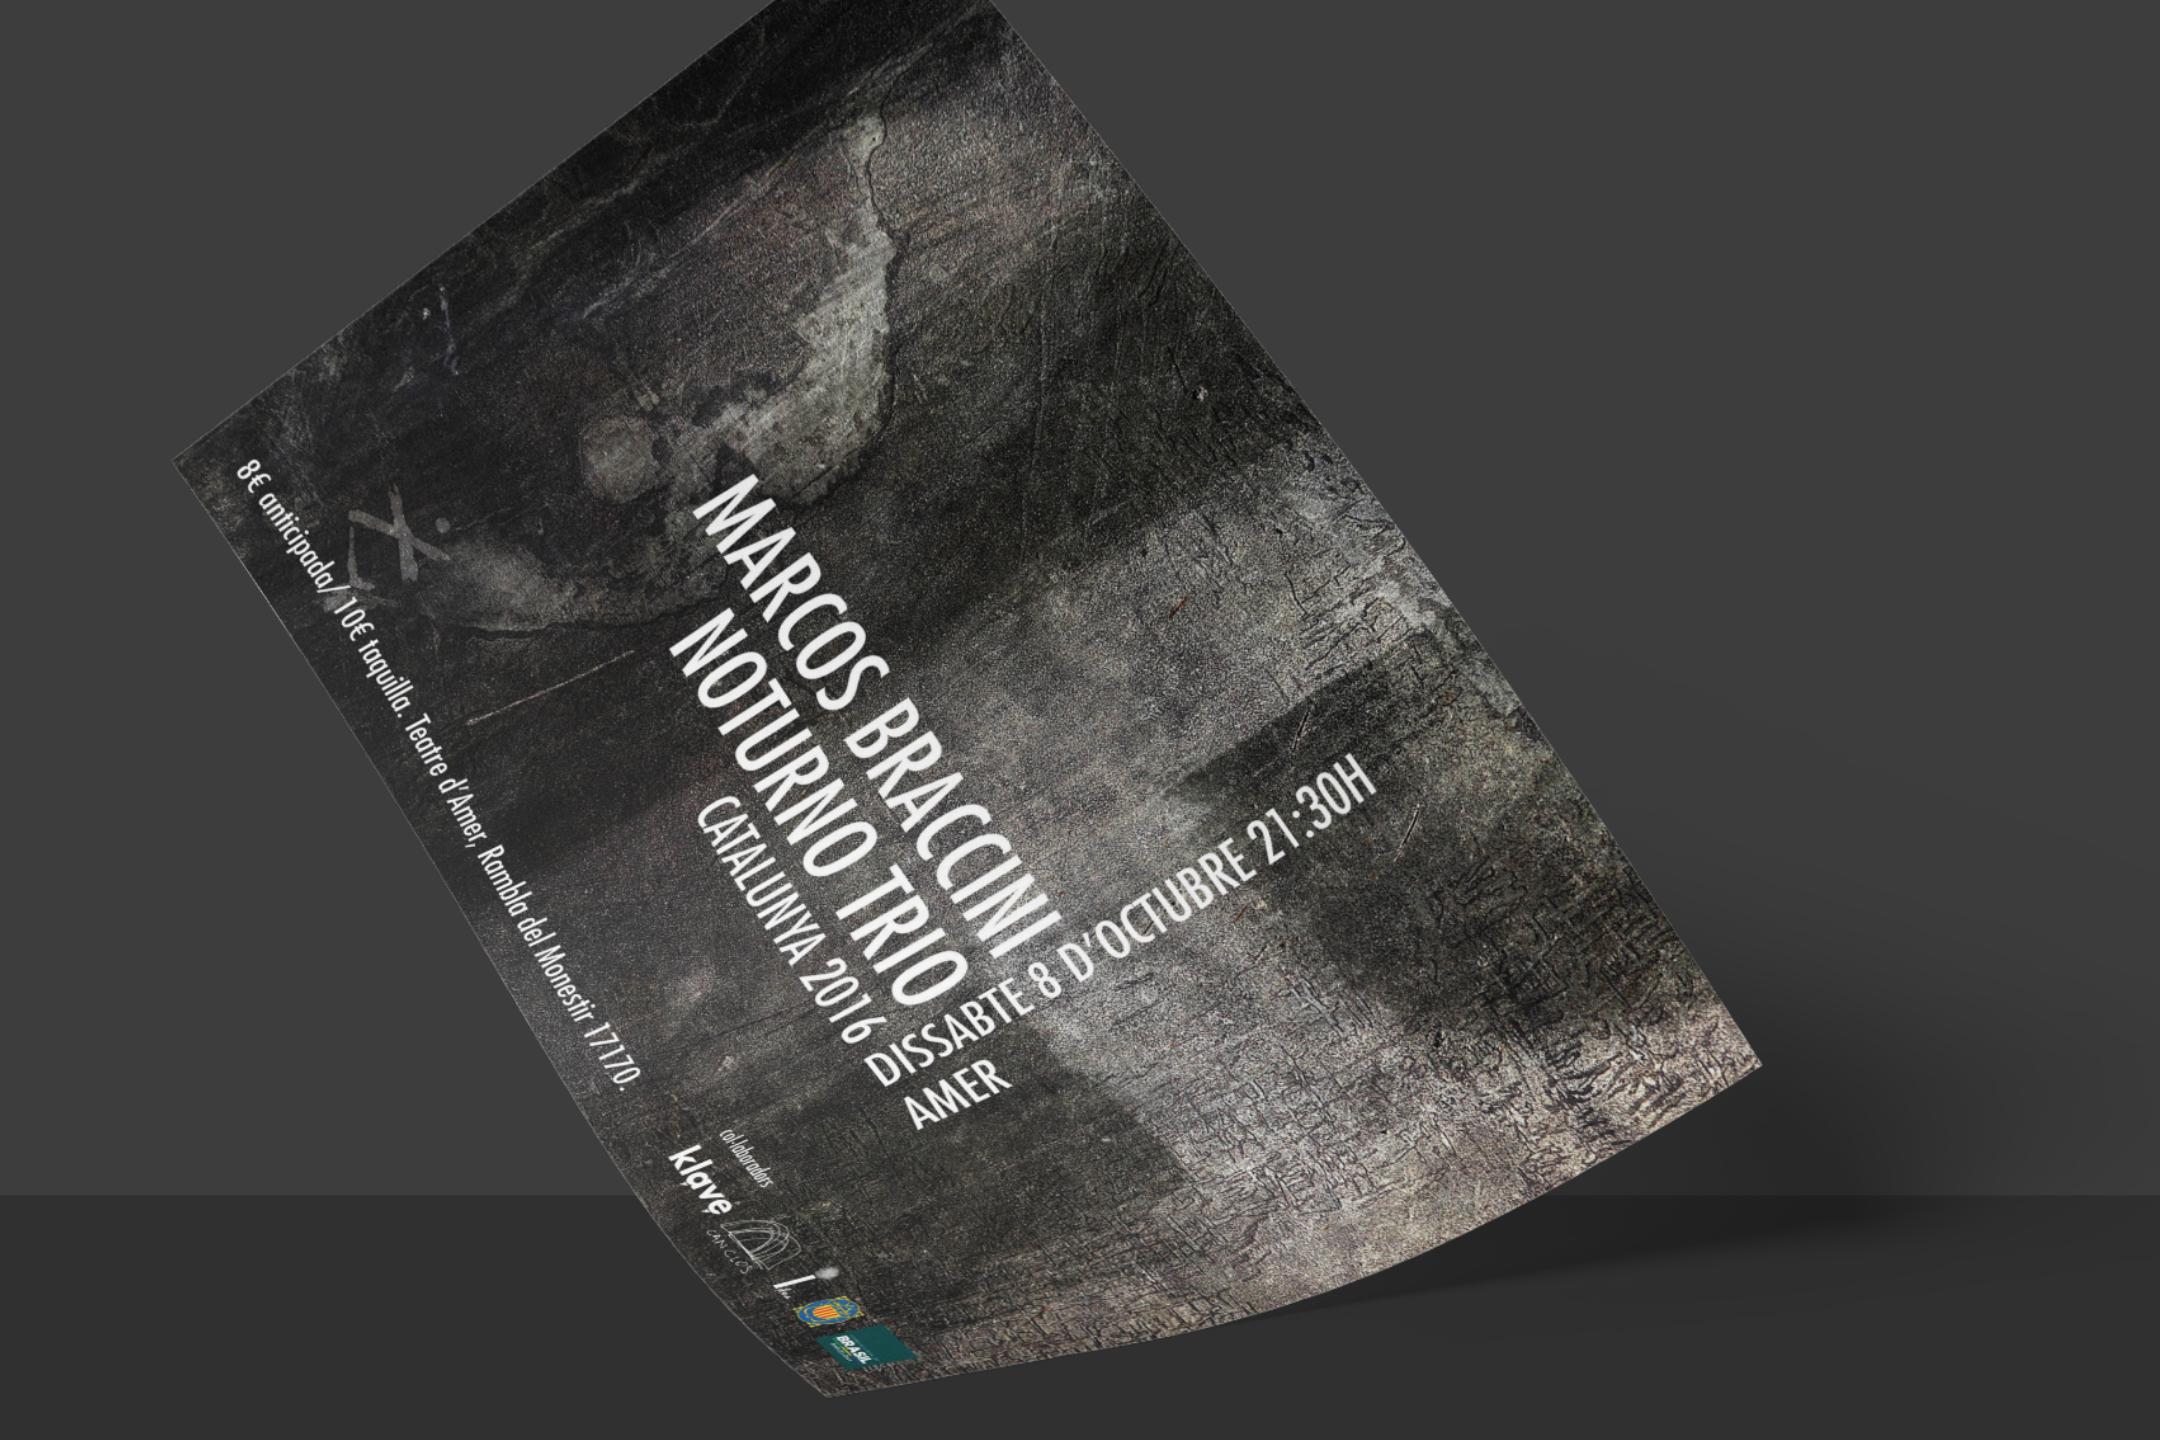 Noturno-Poster-Series-2